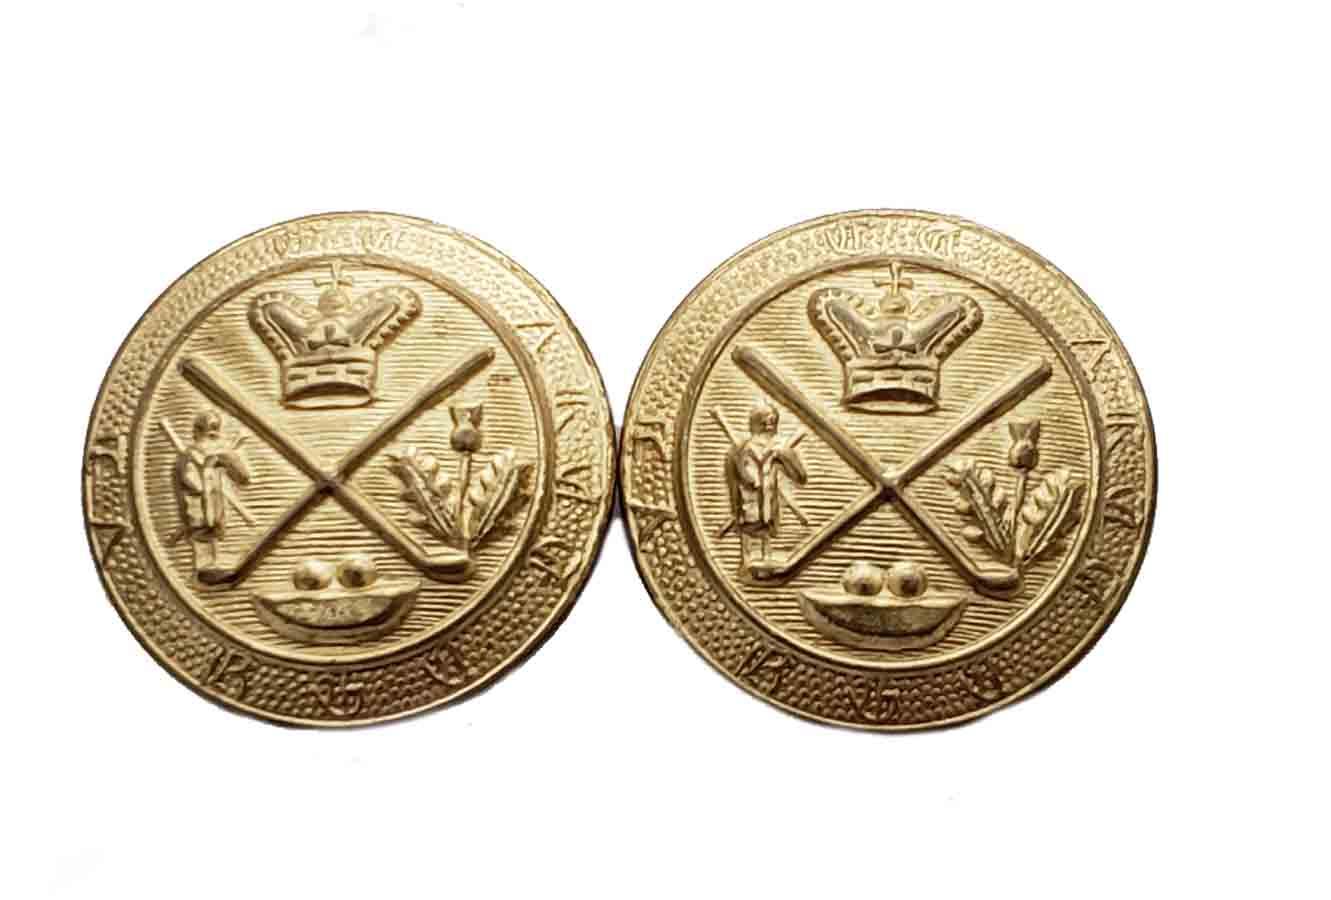 Two Vintage Club Room Royal Blackheath Blazer Buttons Golf Gold Brass Shank Men's 7/8